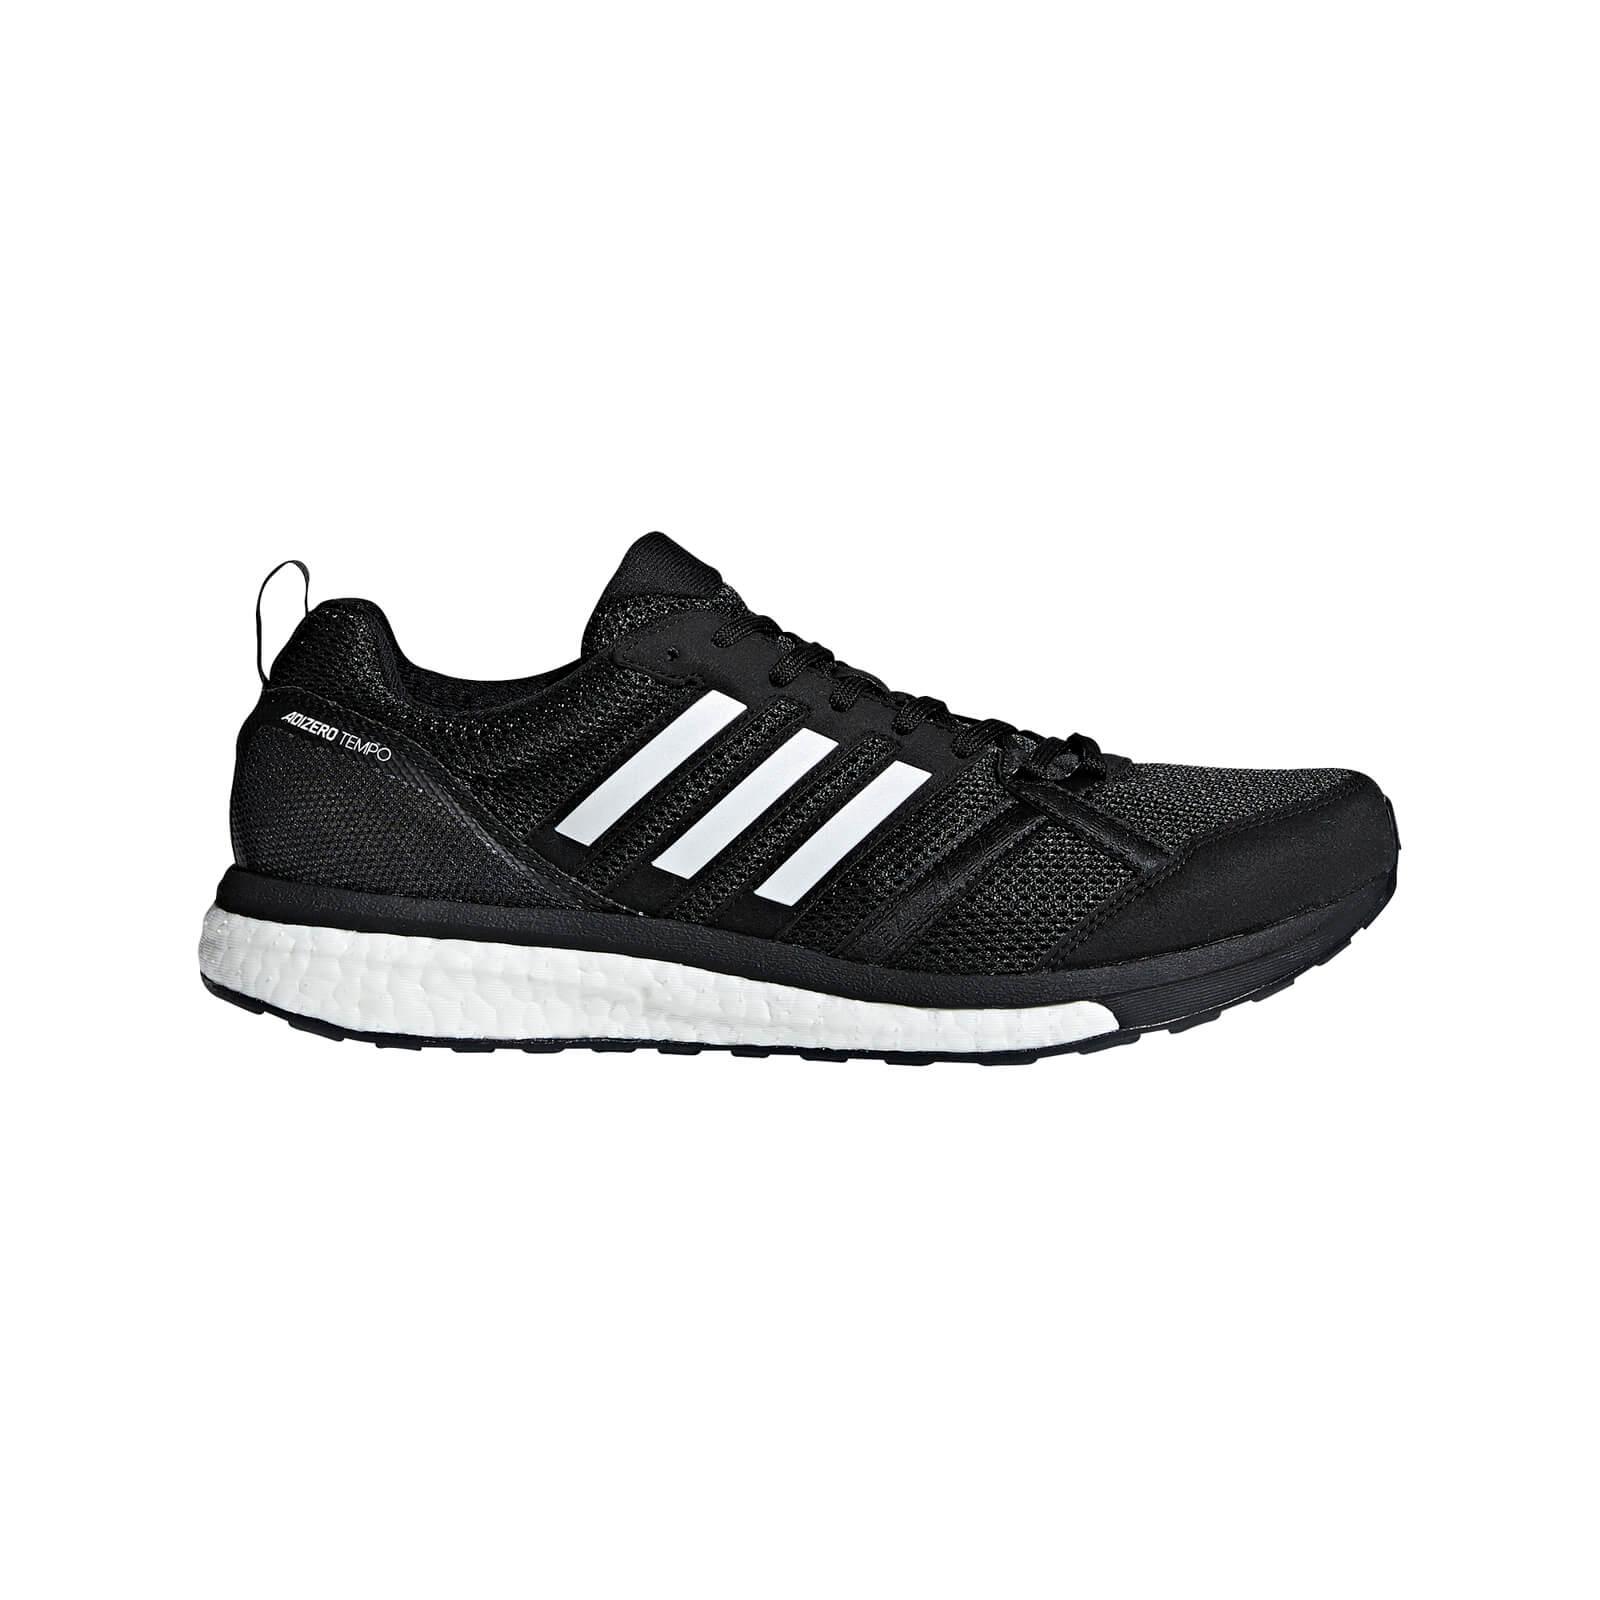 adidas Men's Adizero Tempo 9 Running Shoes - Black - US 8.5/UK 8 - Black